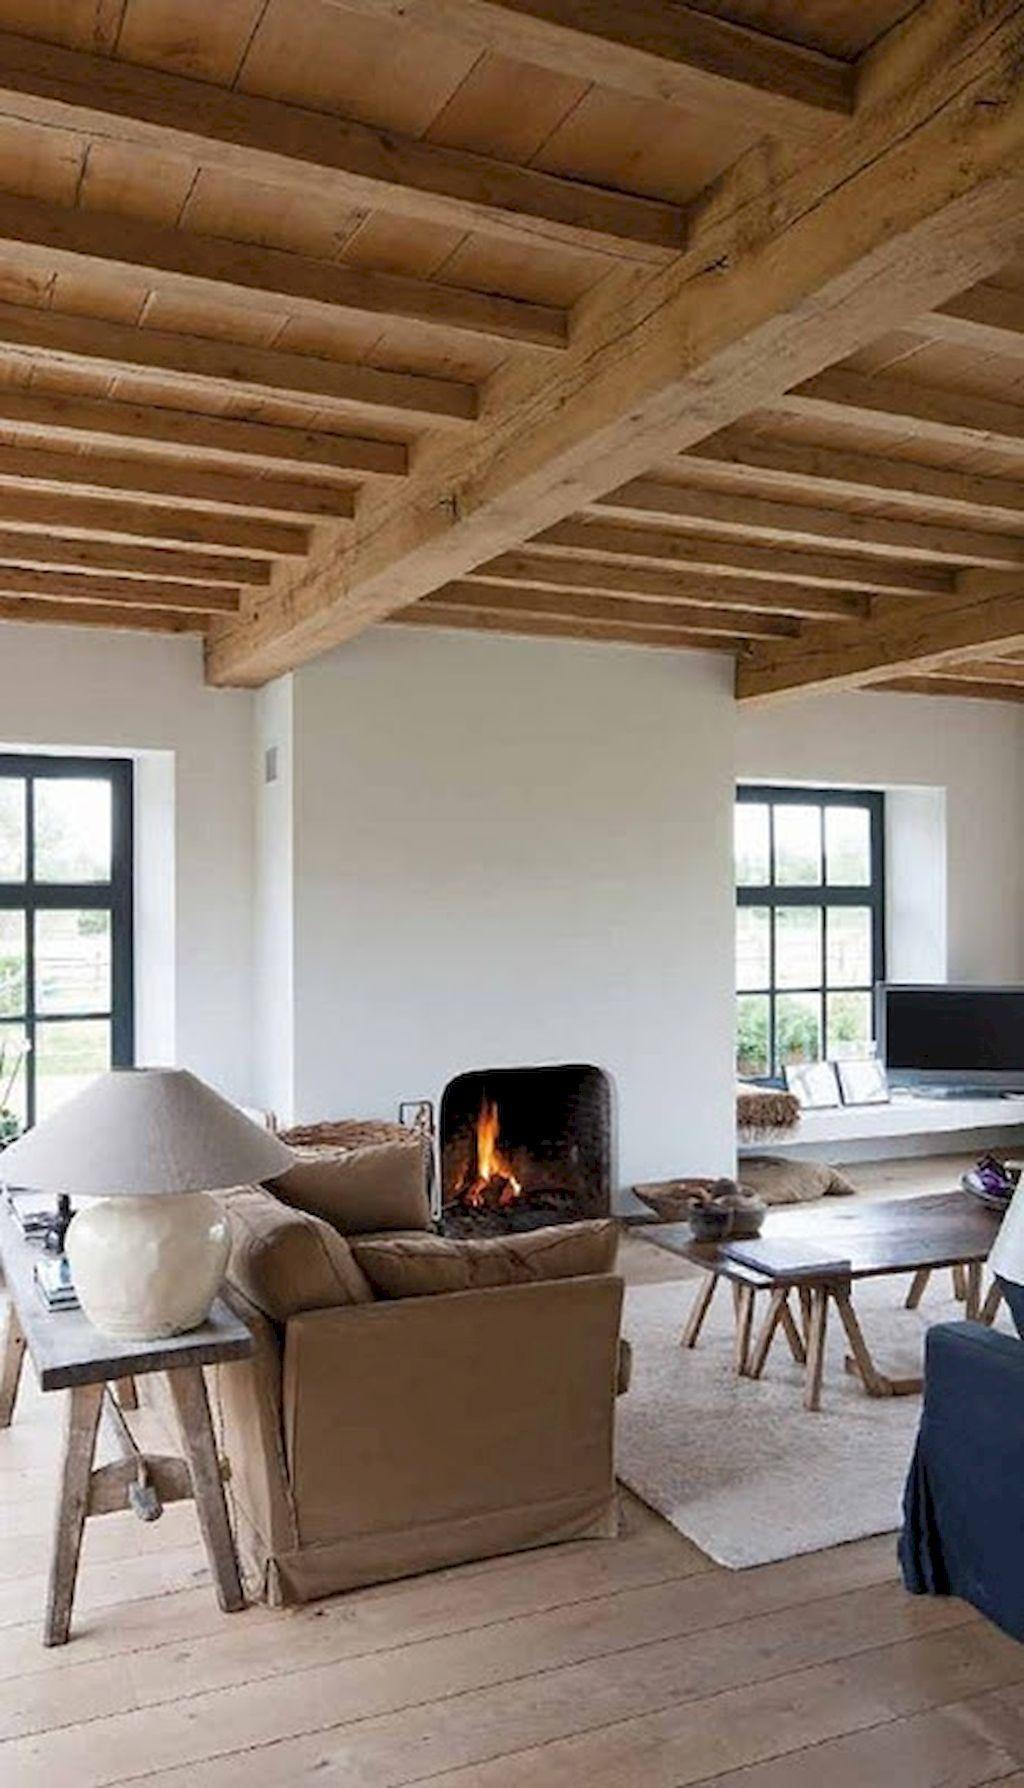 80 incridible rustic farmhouse fireplace ideas makeover (13 is part of Incridible Rustic Farmhouse Fireplace Ideas Makeover - 80 incridible rustic farmhouse fireplace ideas makeover (13)